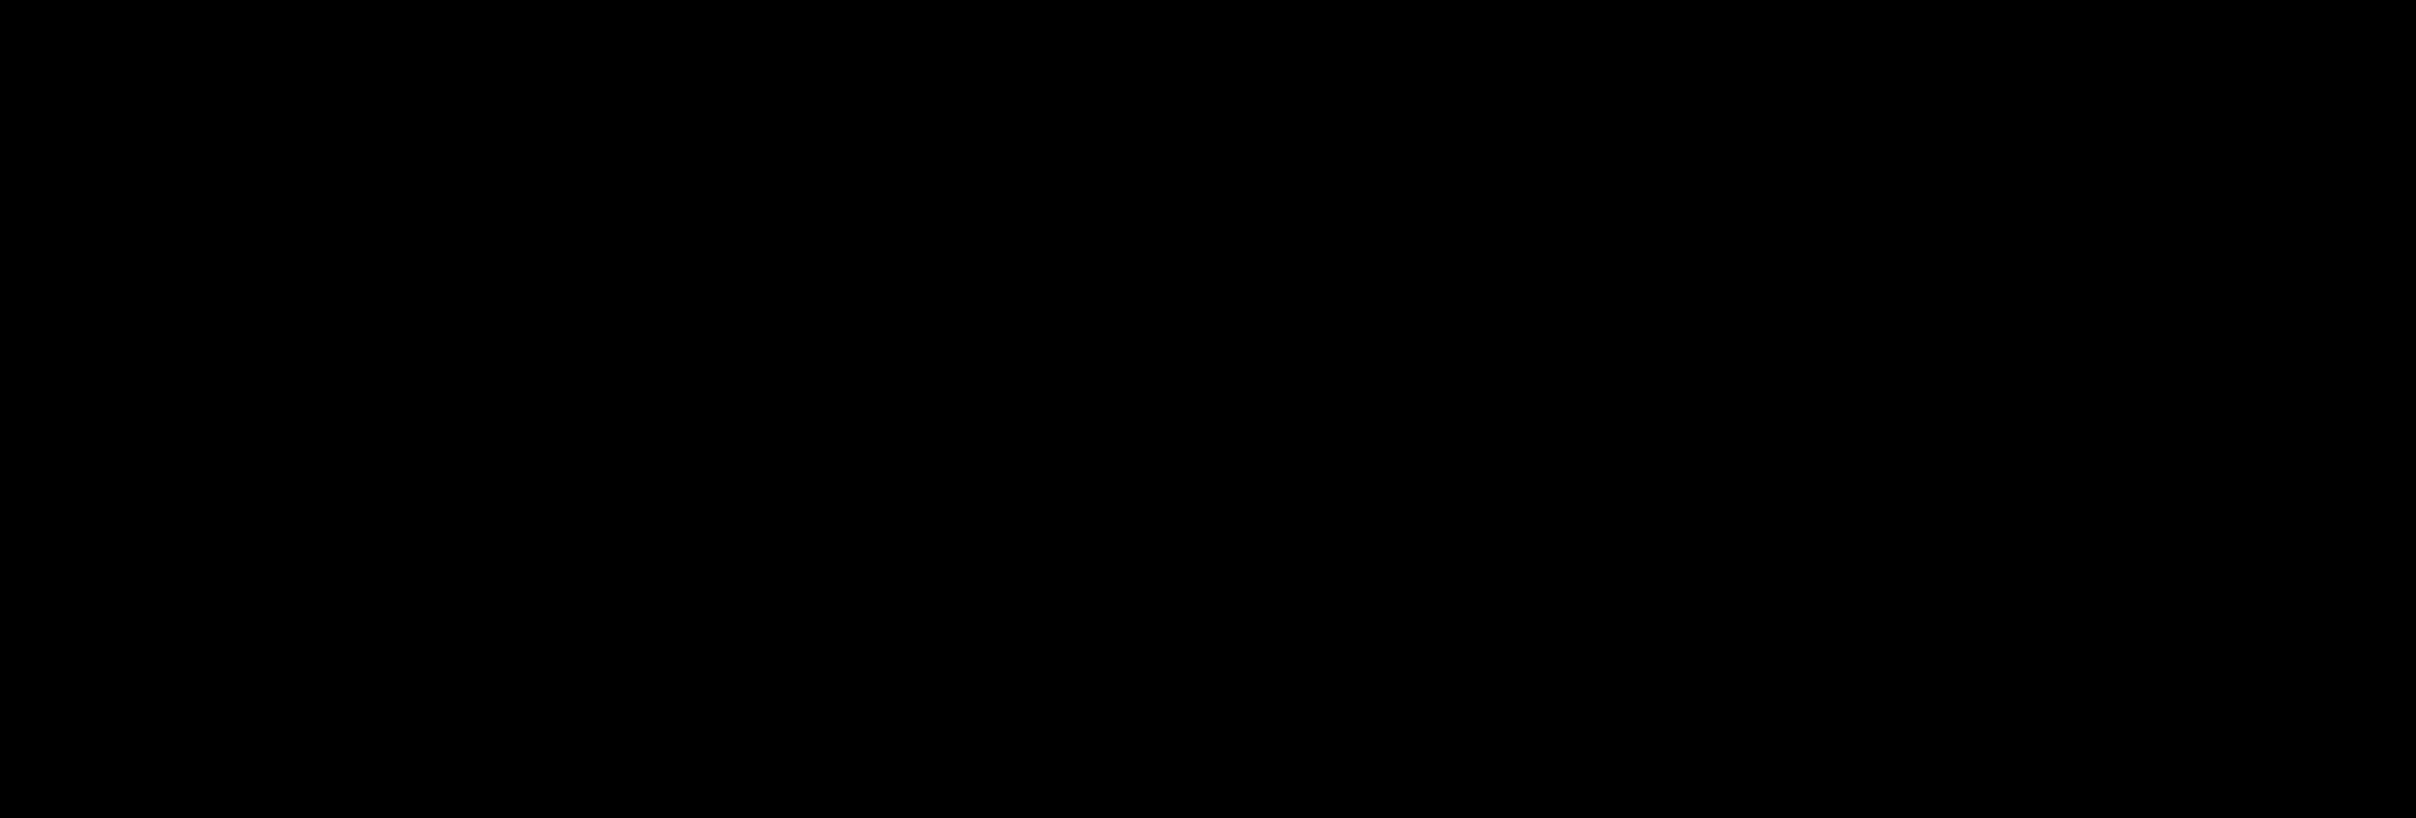 Tacrine-6-ferulic acid-d<sub>3</sub>